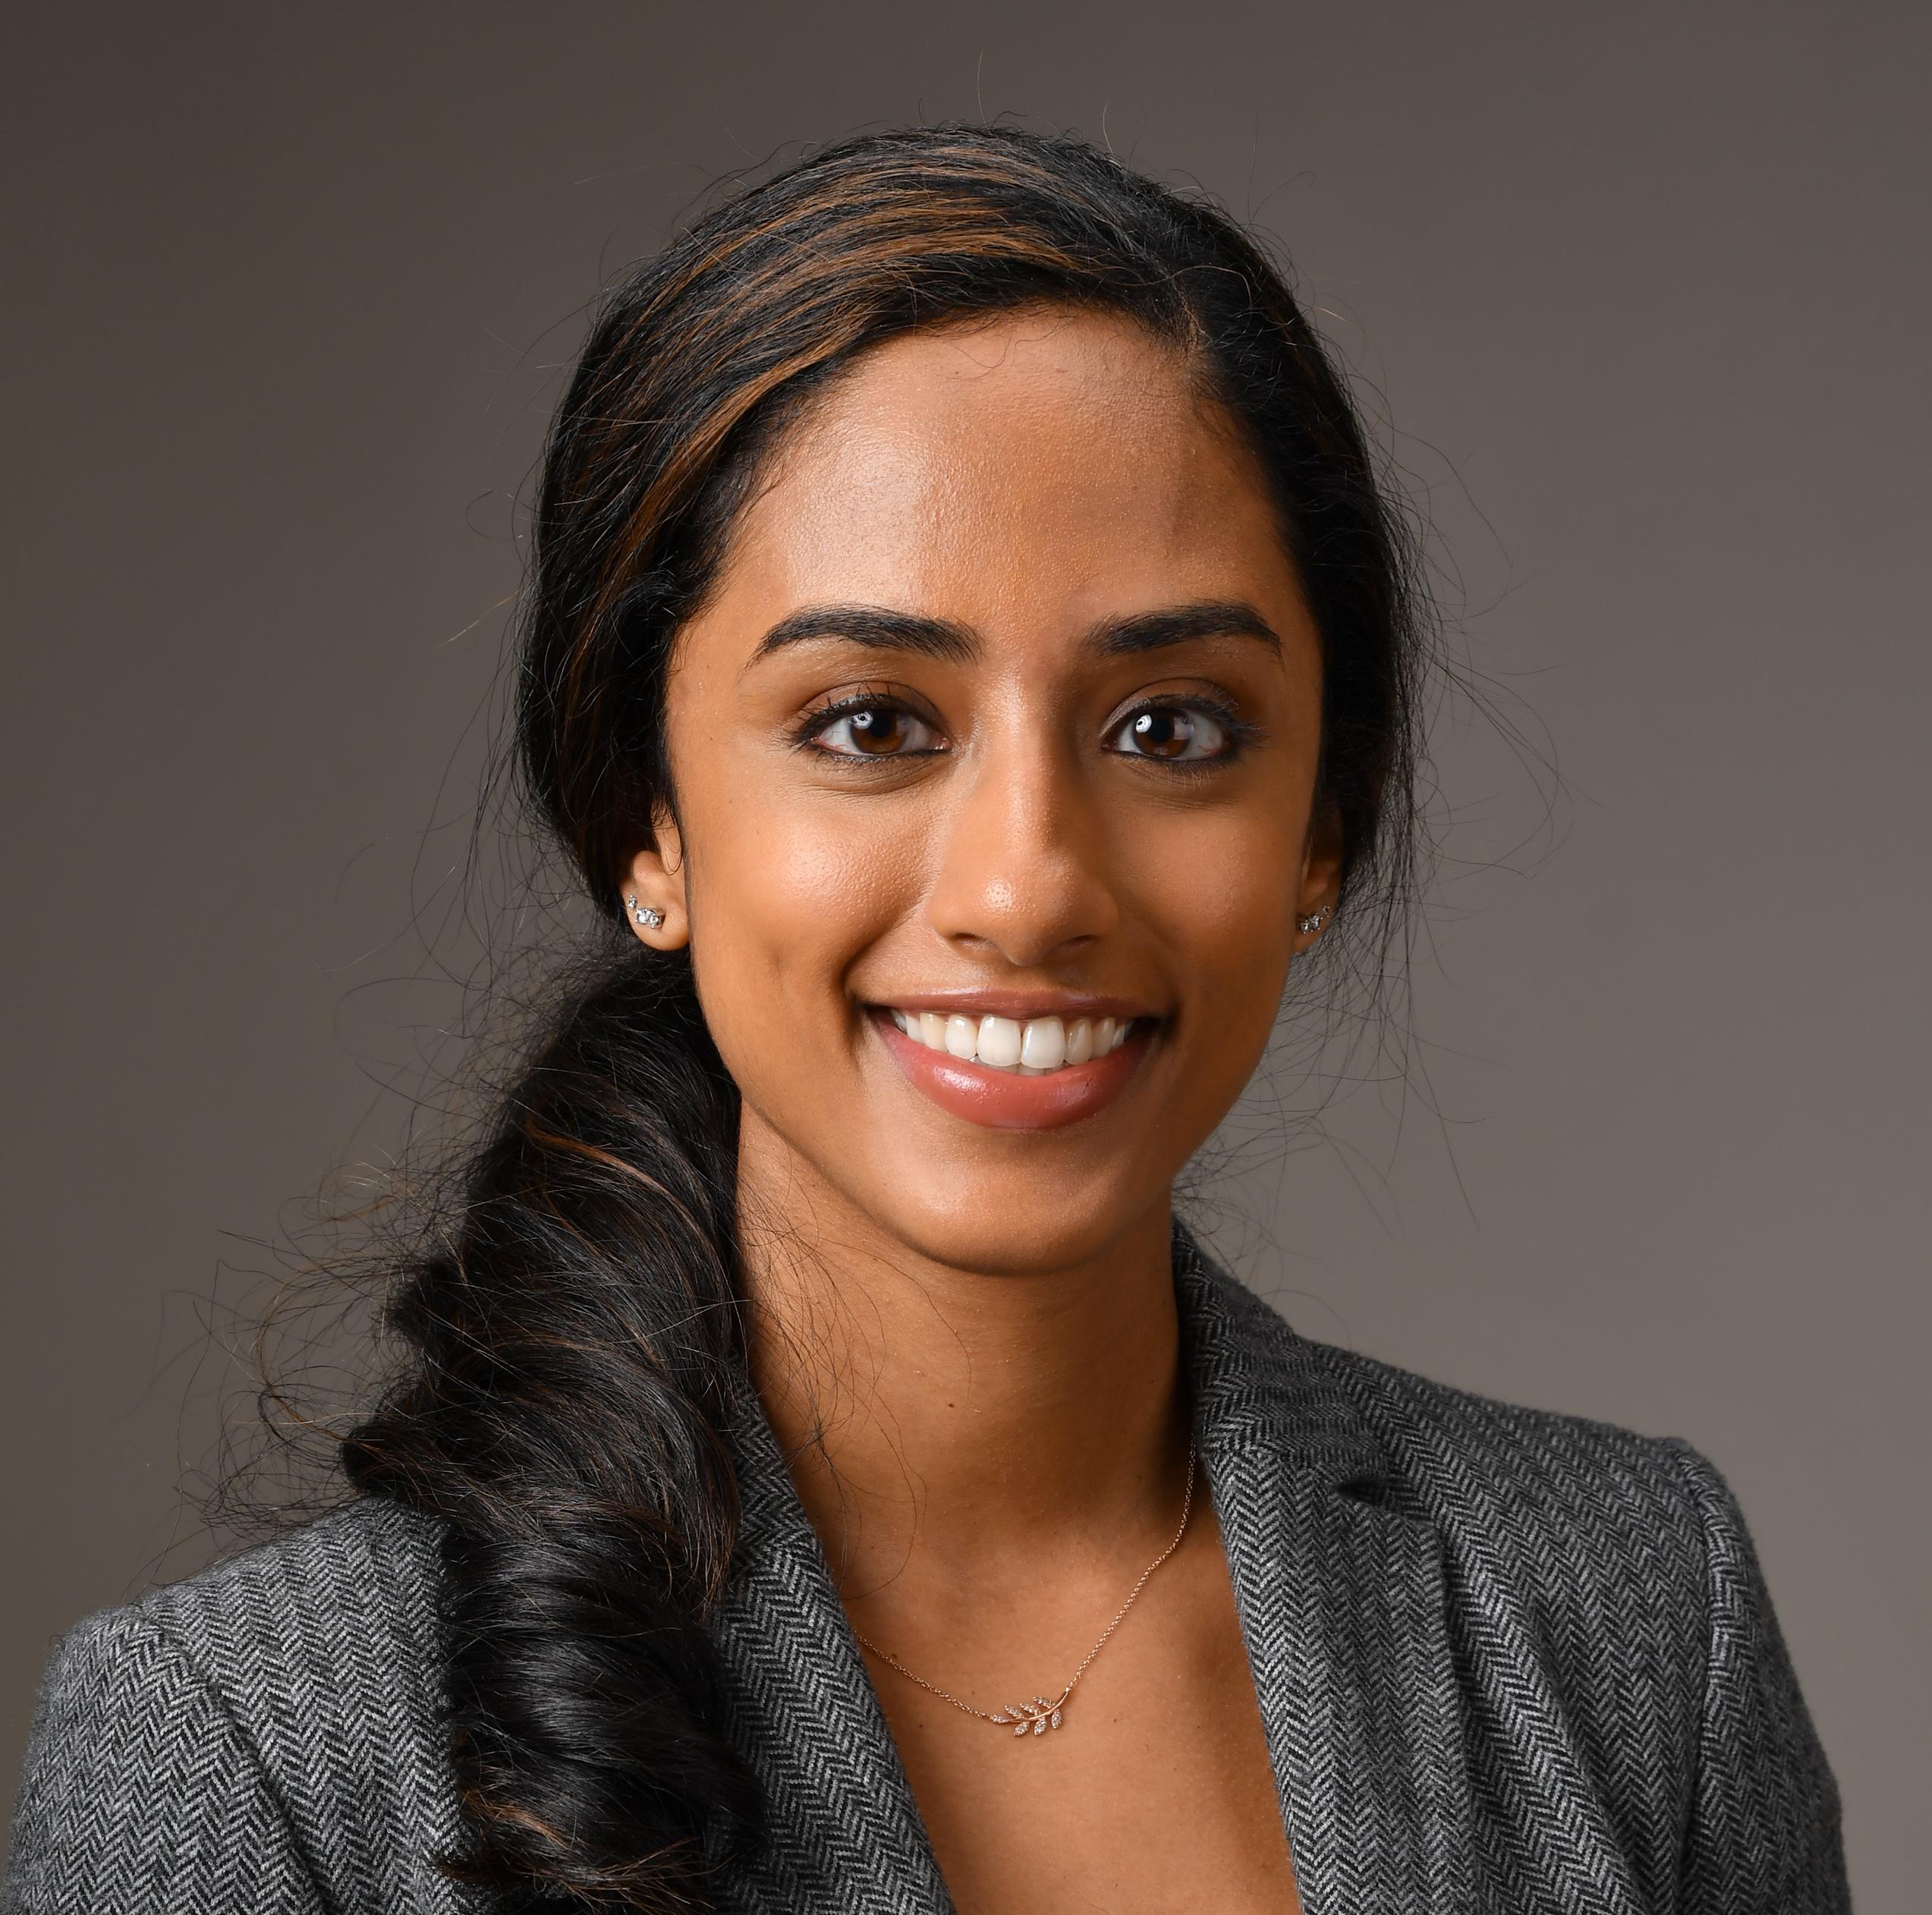 Bio photo of Cheryl Varghese, Ph.D.